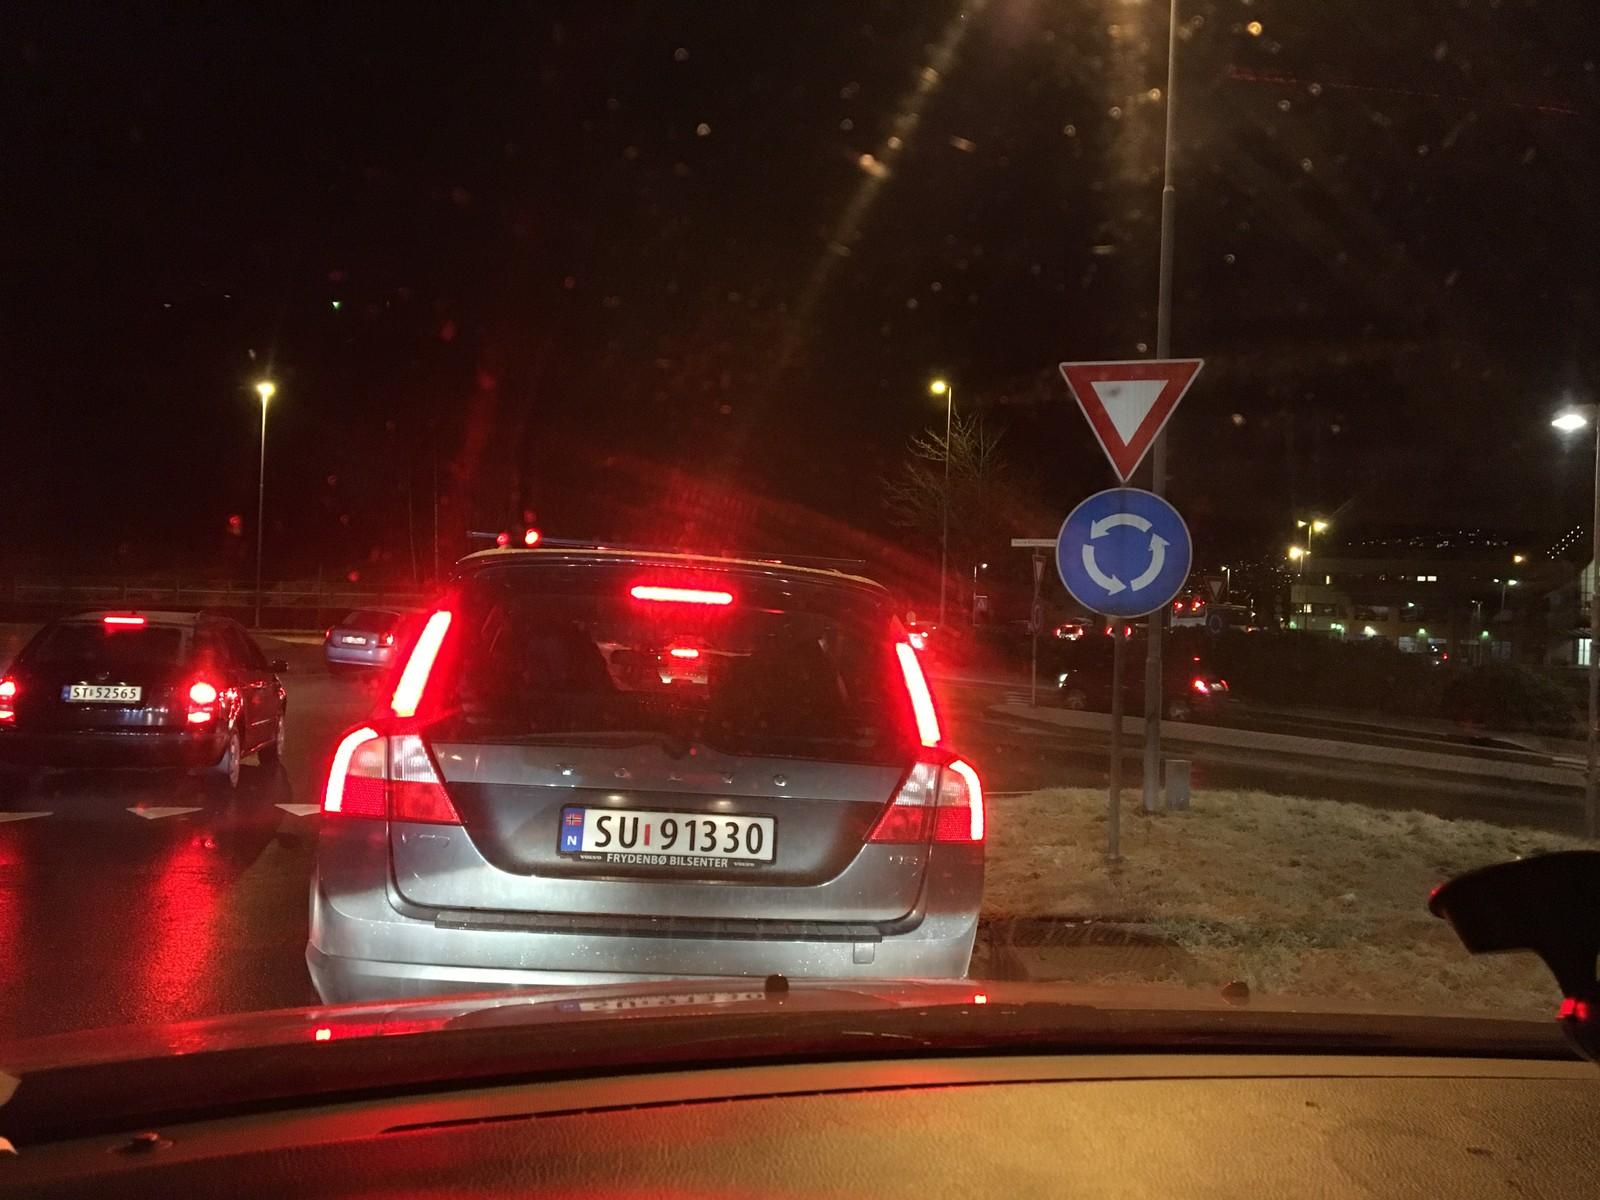 Fra Askøy til sentrum har køen gått svært sakte.